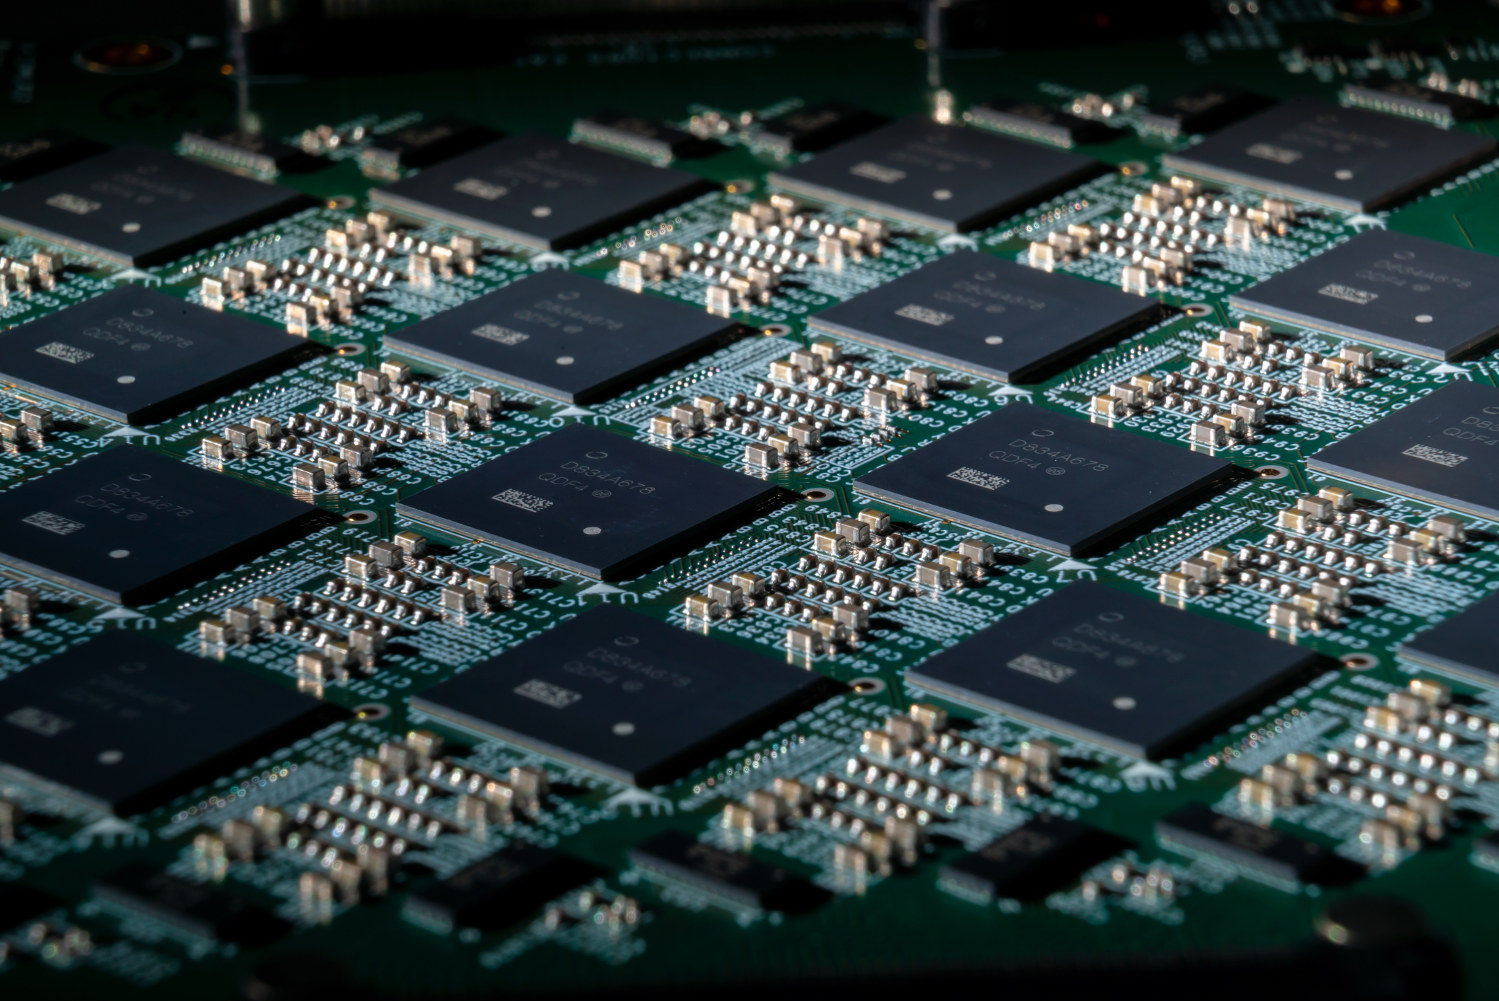 Плата <i>Nahuku</i> с32 нейроморфными процессорами <i>Loihi</i>. Система <i>Pohoiki Springs</i> состоит из 24 таких плат (<i>Intel Corporation</i>).